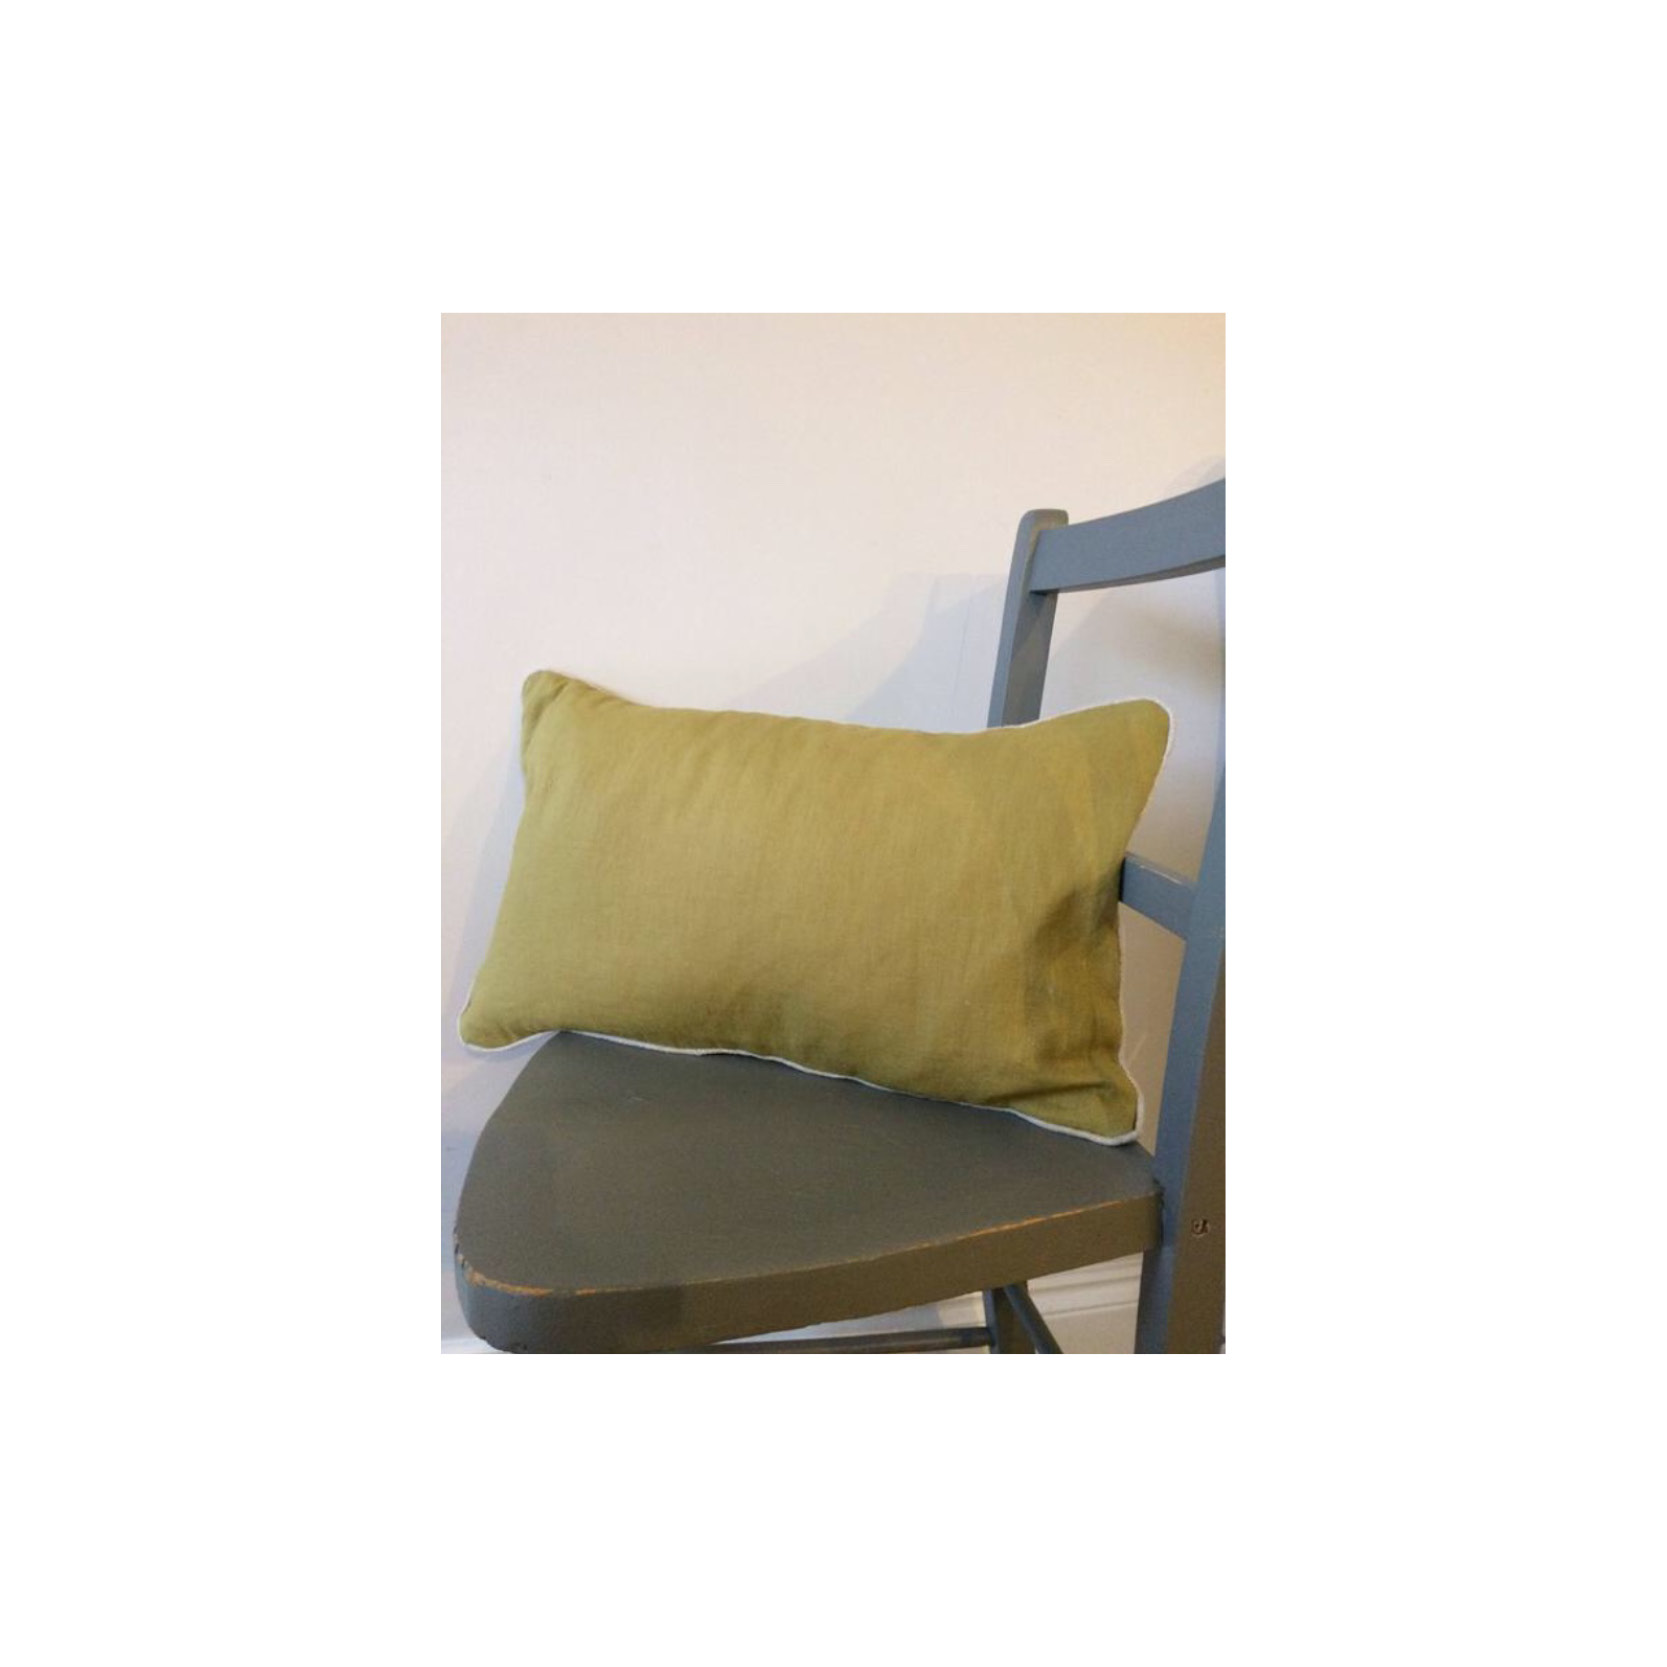 Pebble & Stripe - Rectangular olive cushion